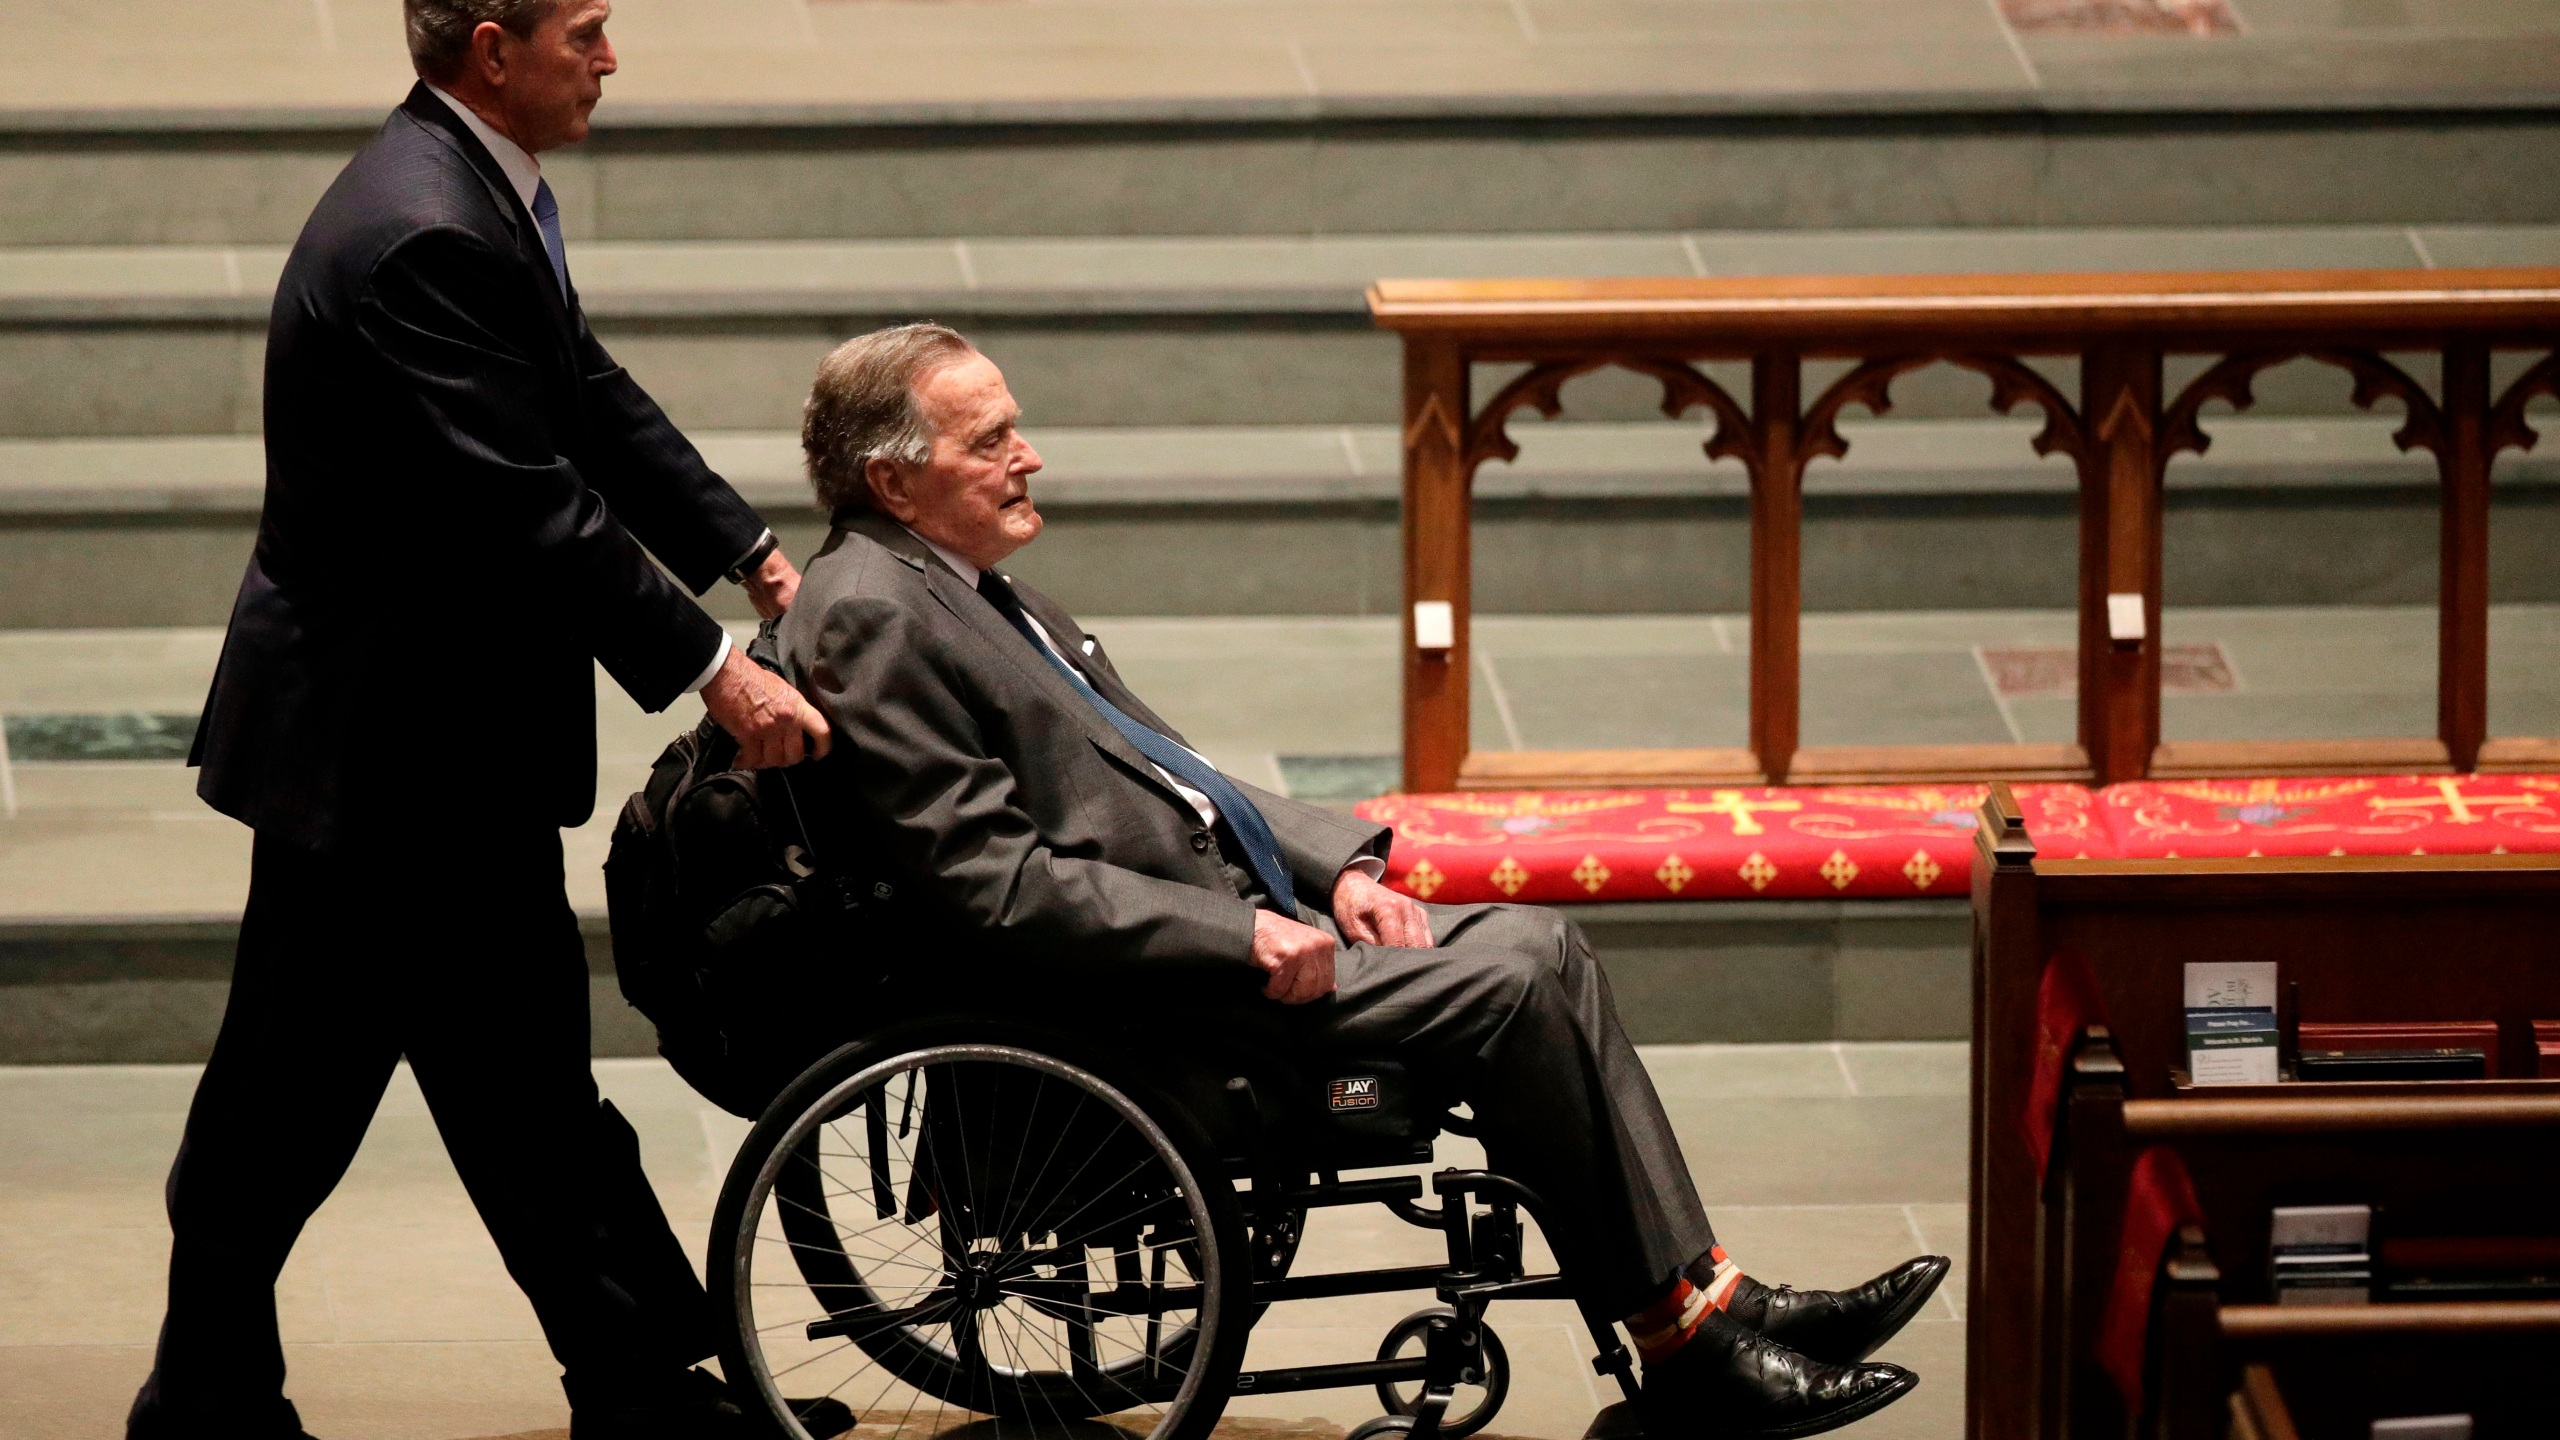 George_H.W._Bush_Hospitalized_95850-159532.jpg99709665